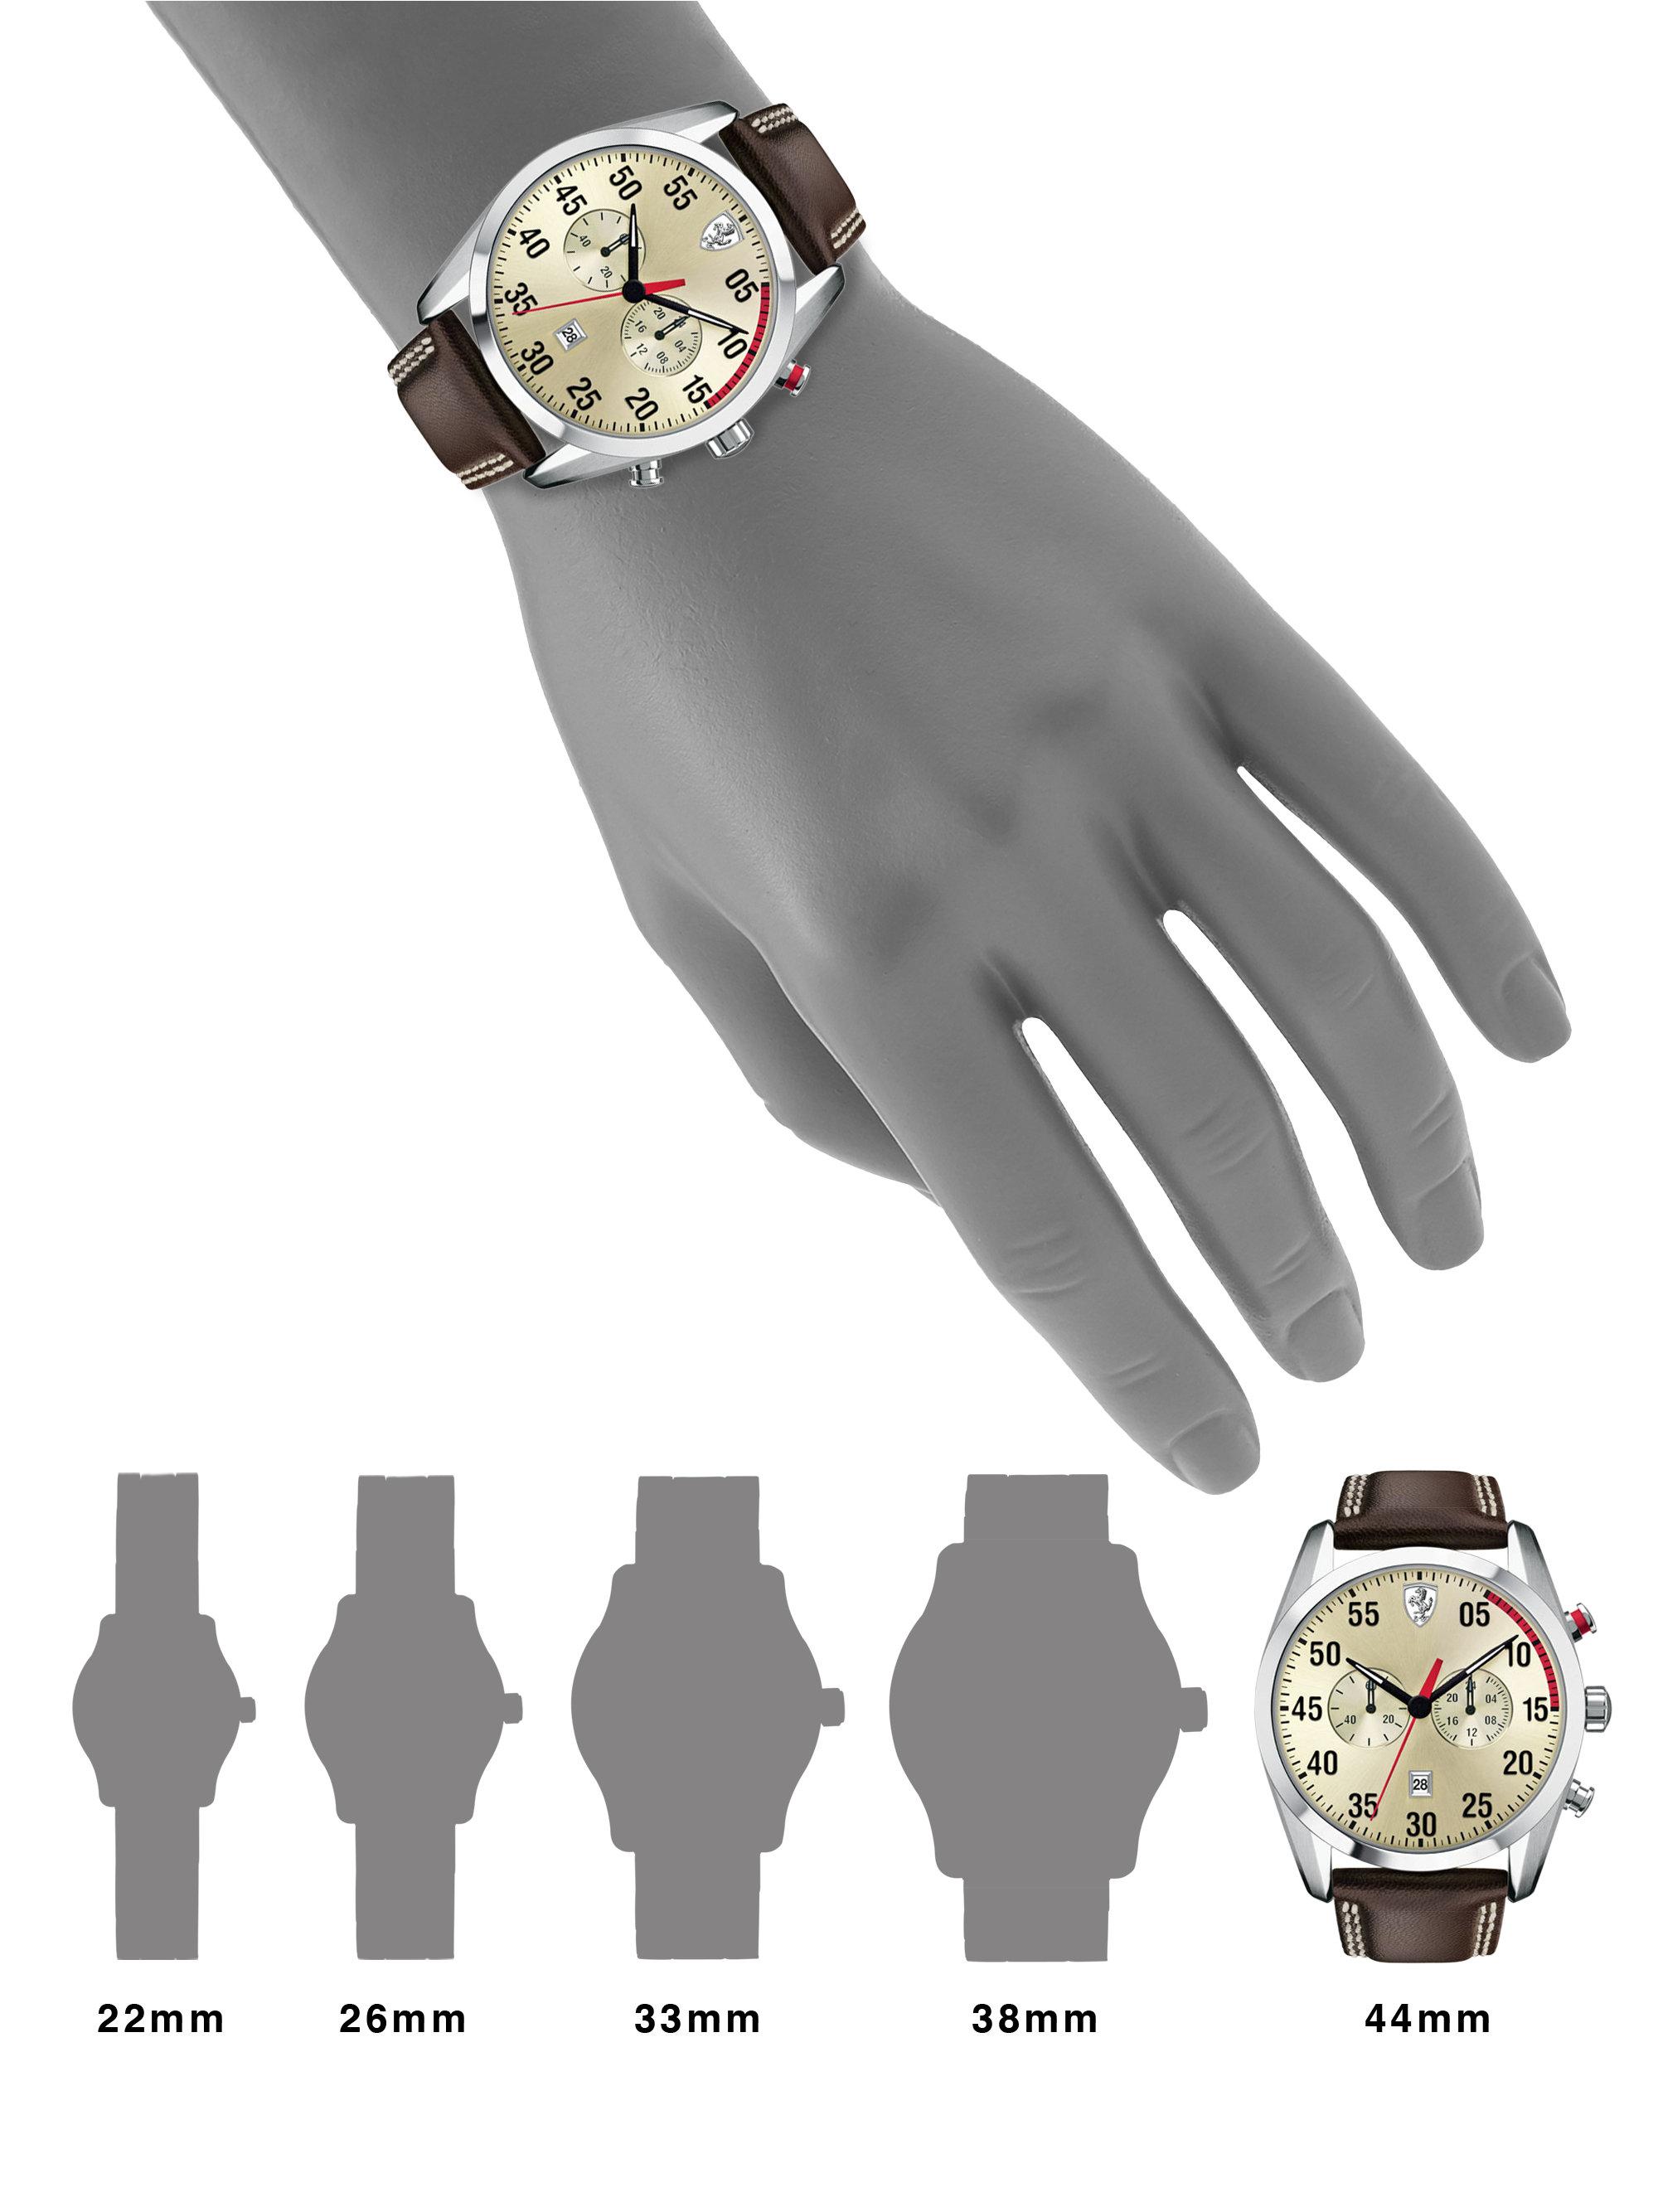 women chopard chronograph imperiale watches s ferrari watch womens automatic